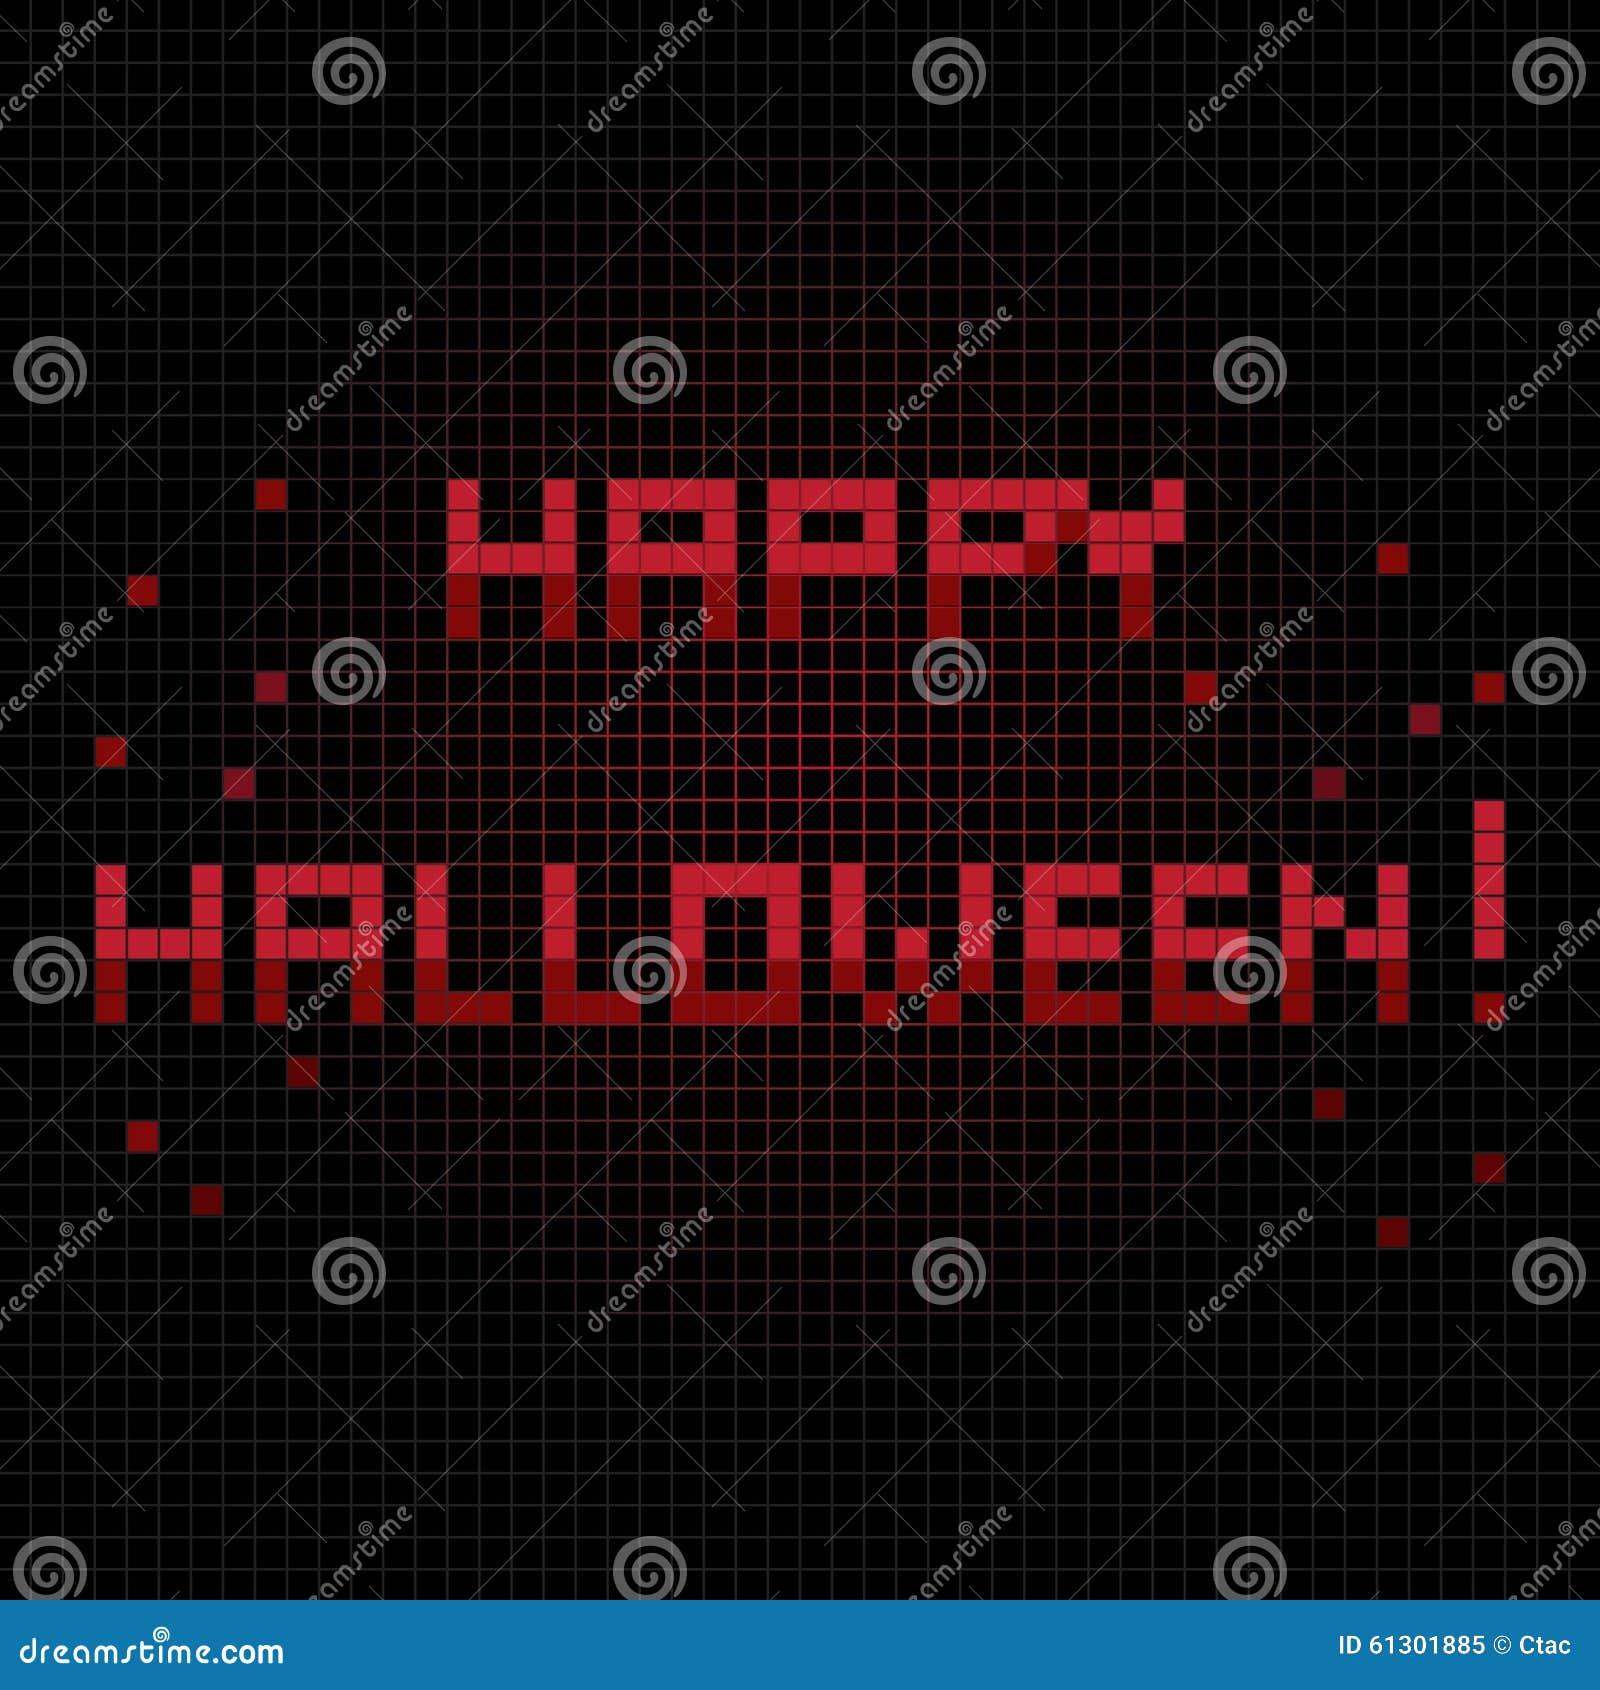 happy halloween halo - Halloween Halo